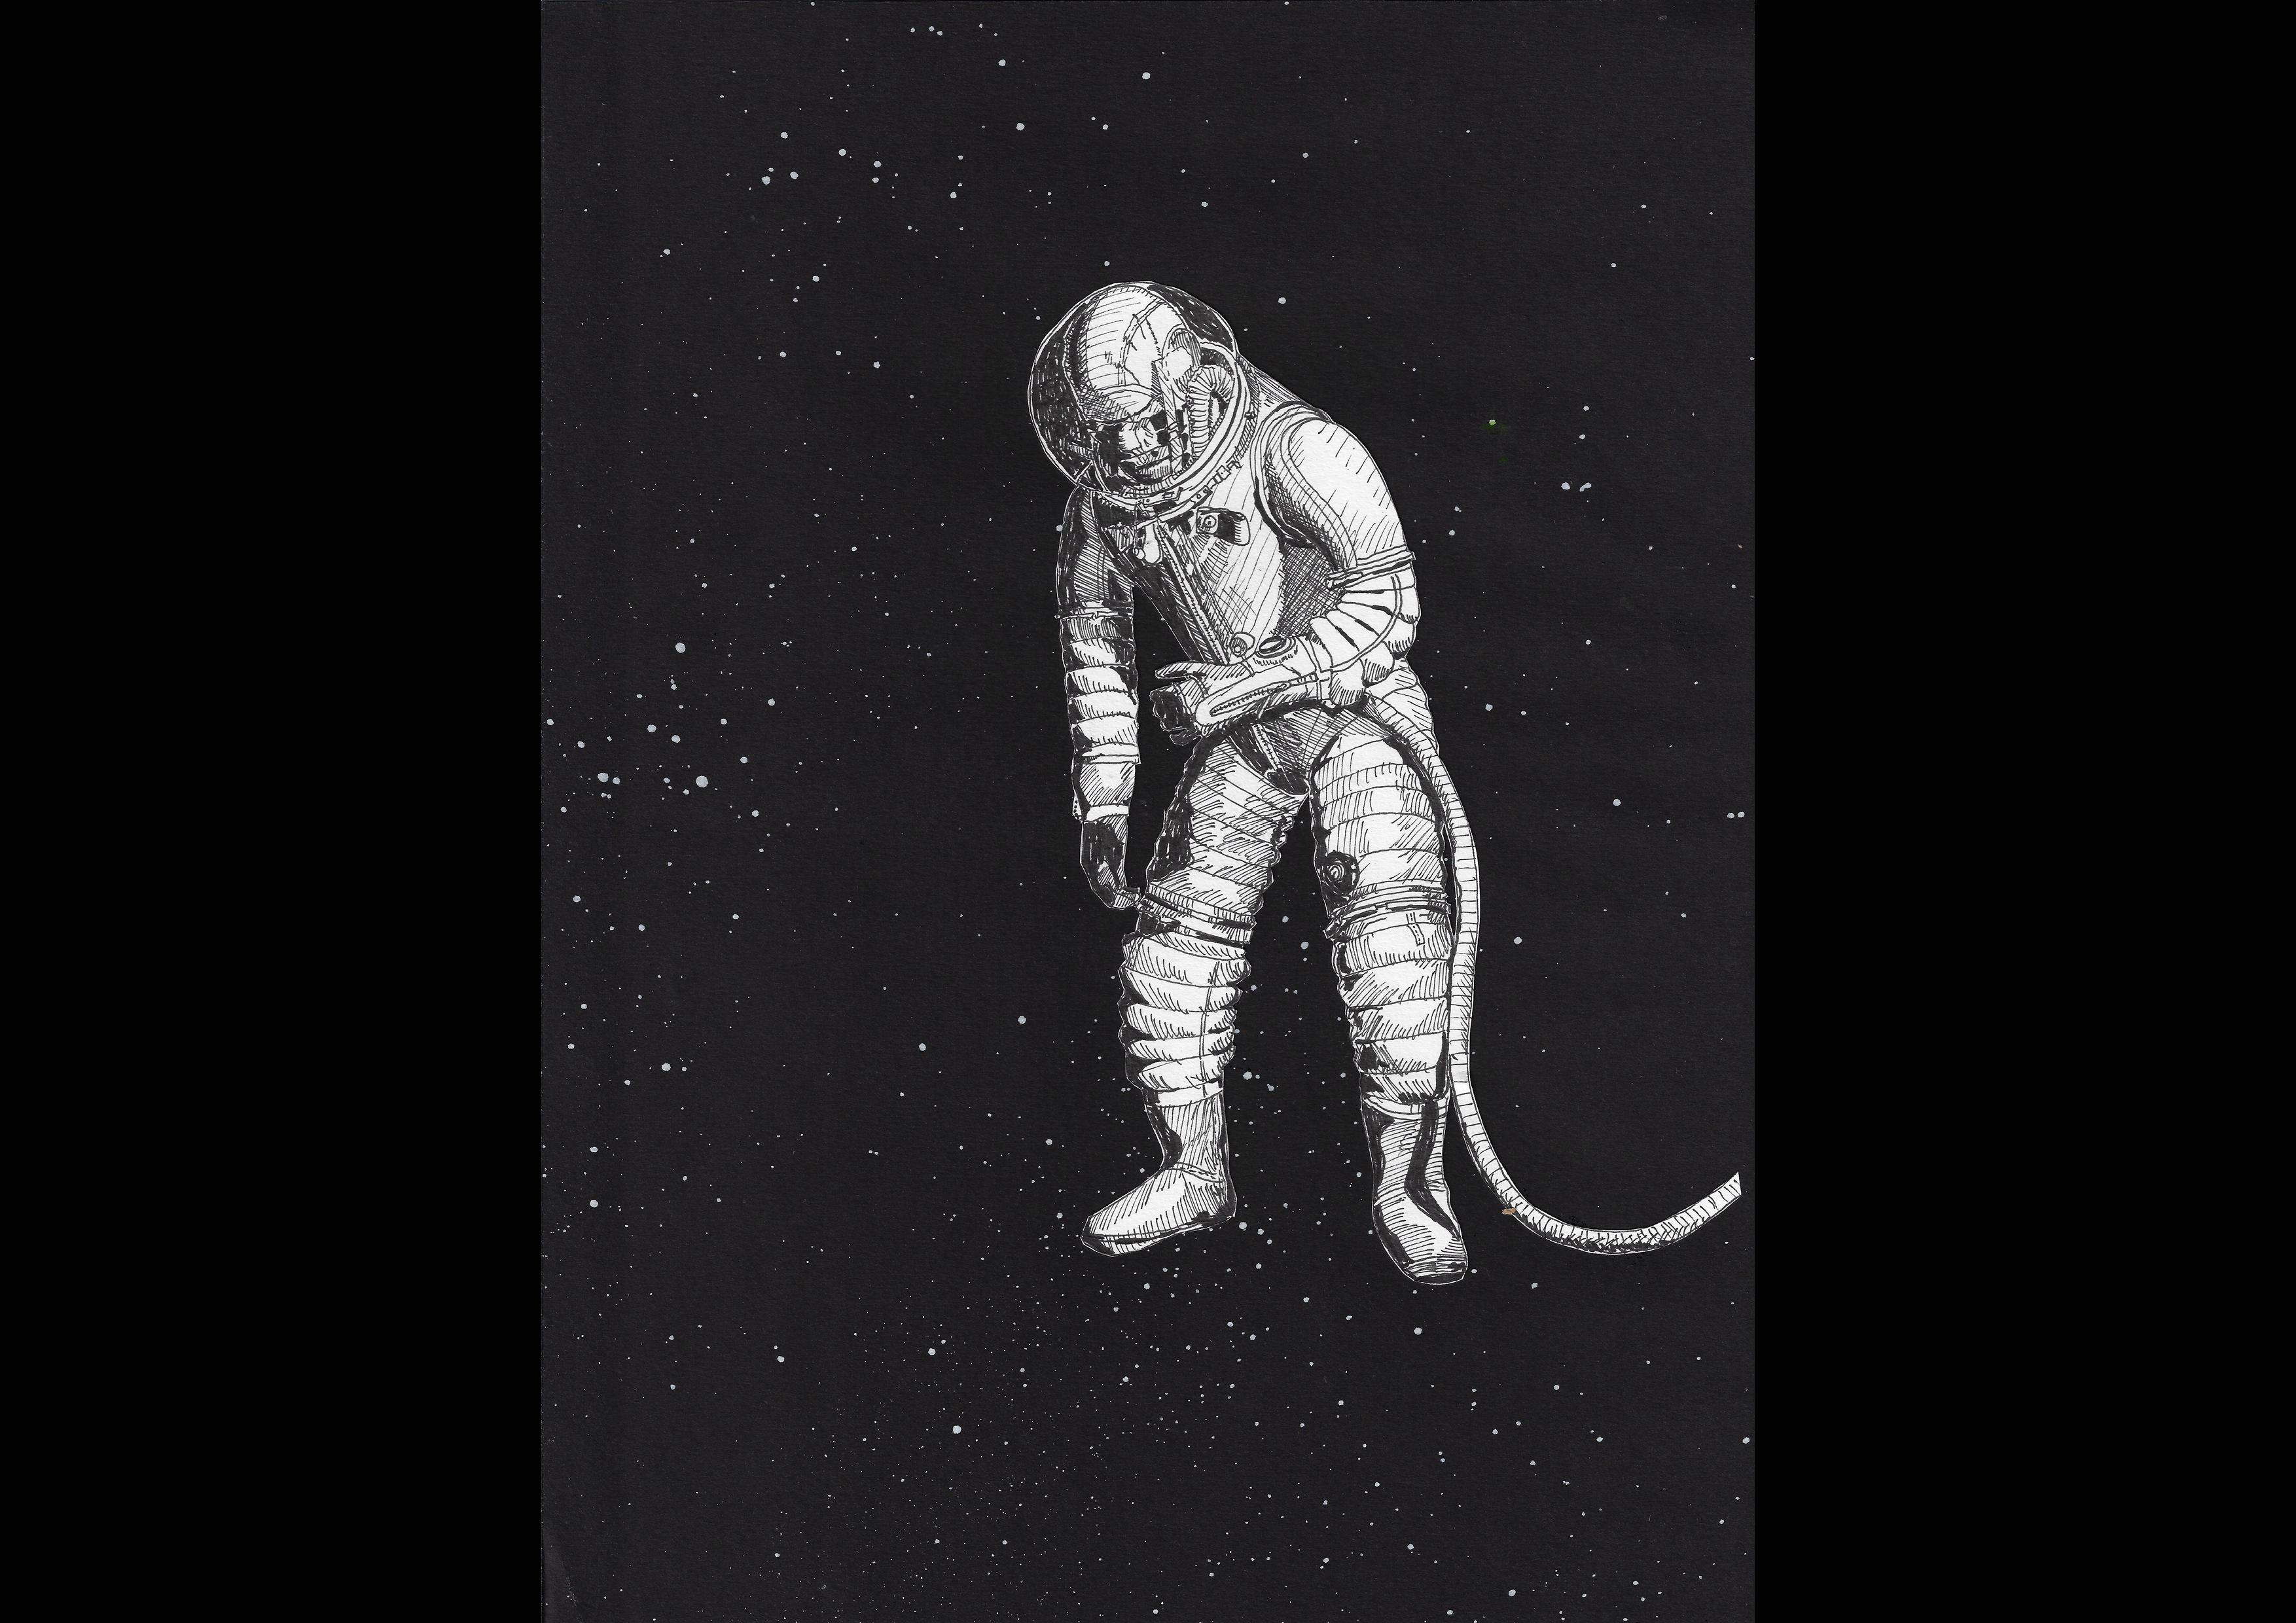 pierre_charles_jacquemin_cosmonaut